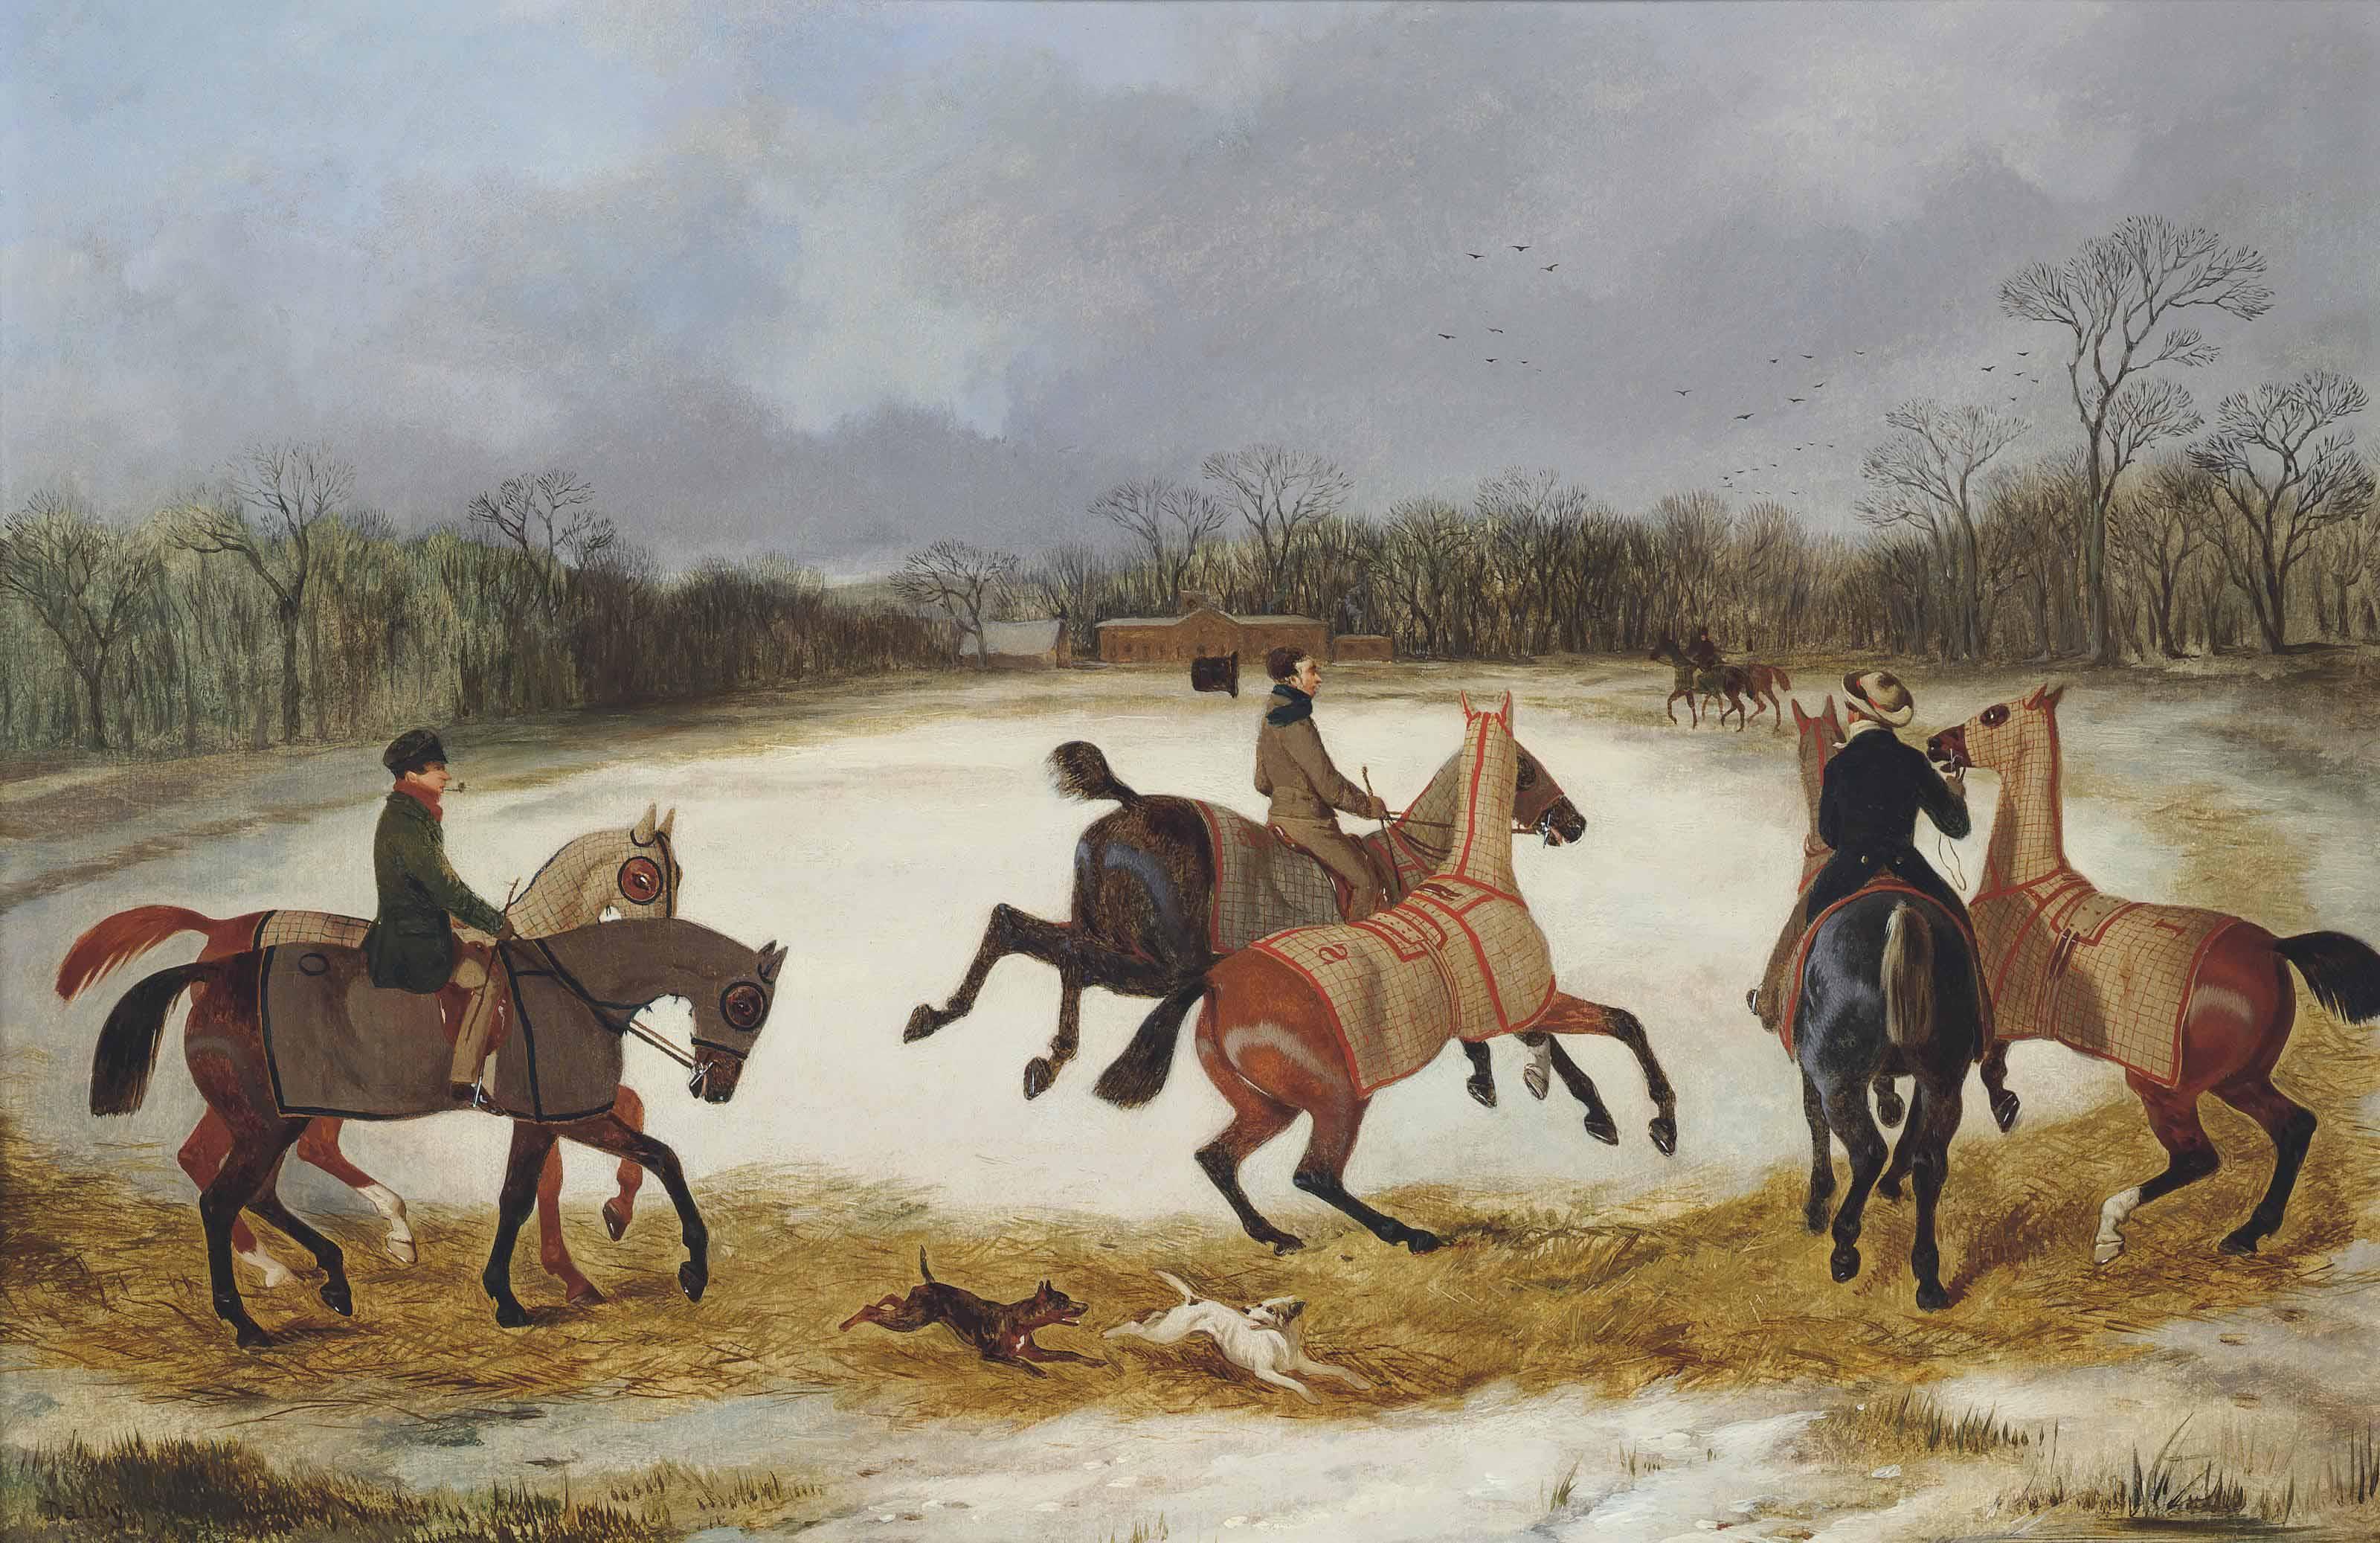 David Dalby of York (1794-1836)